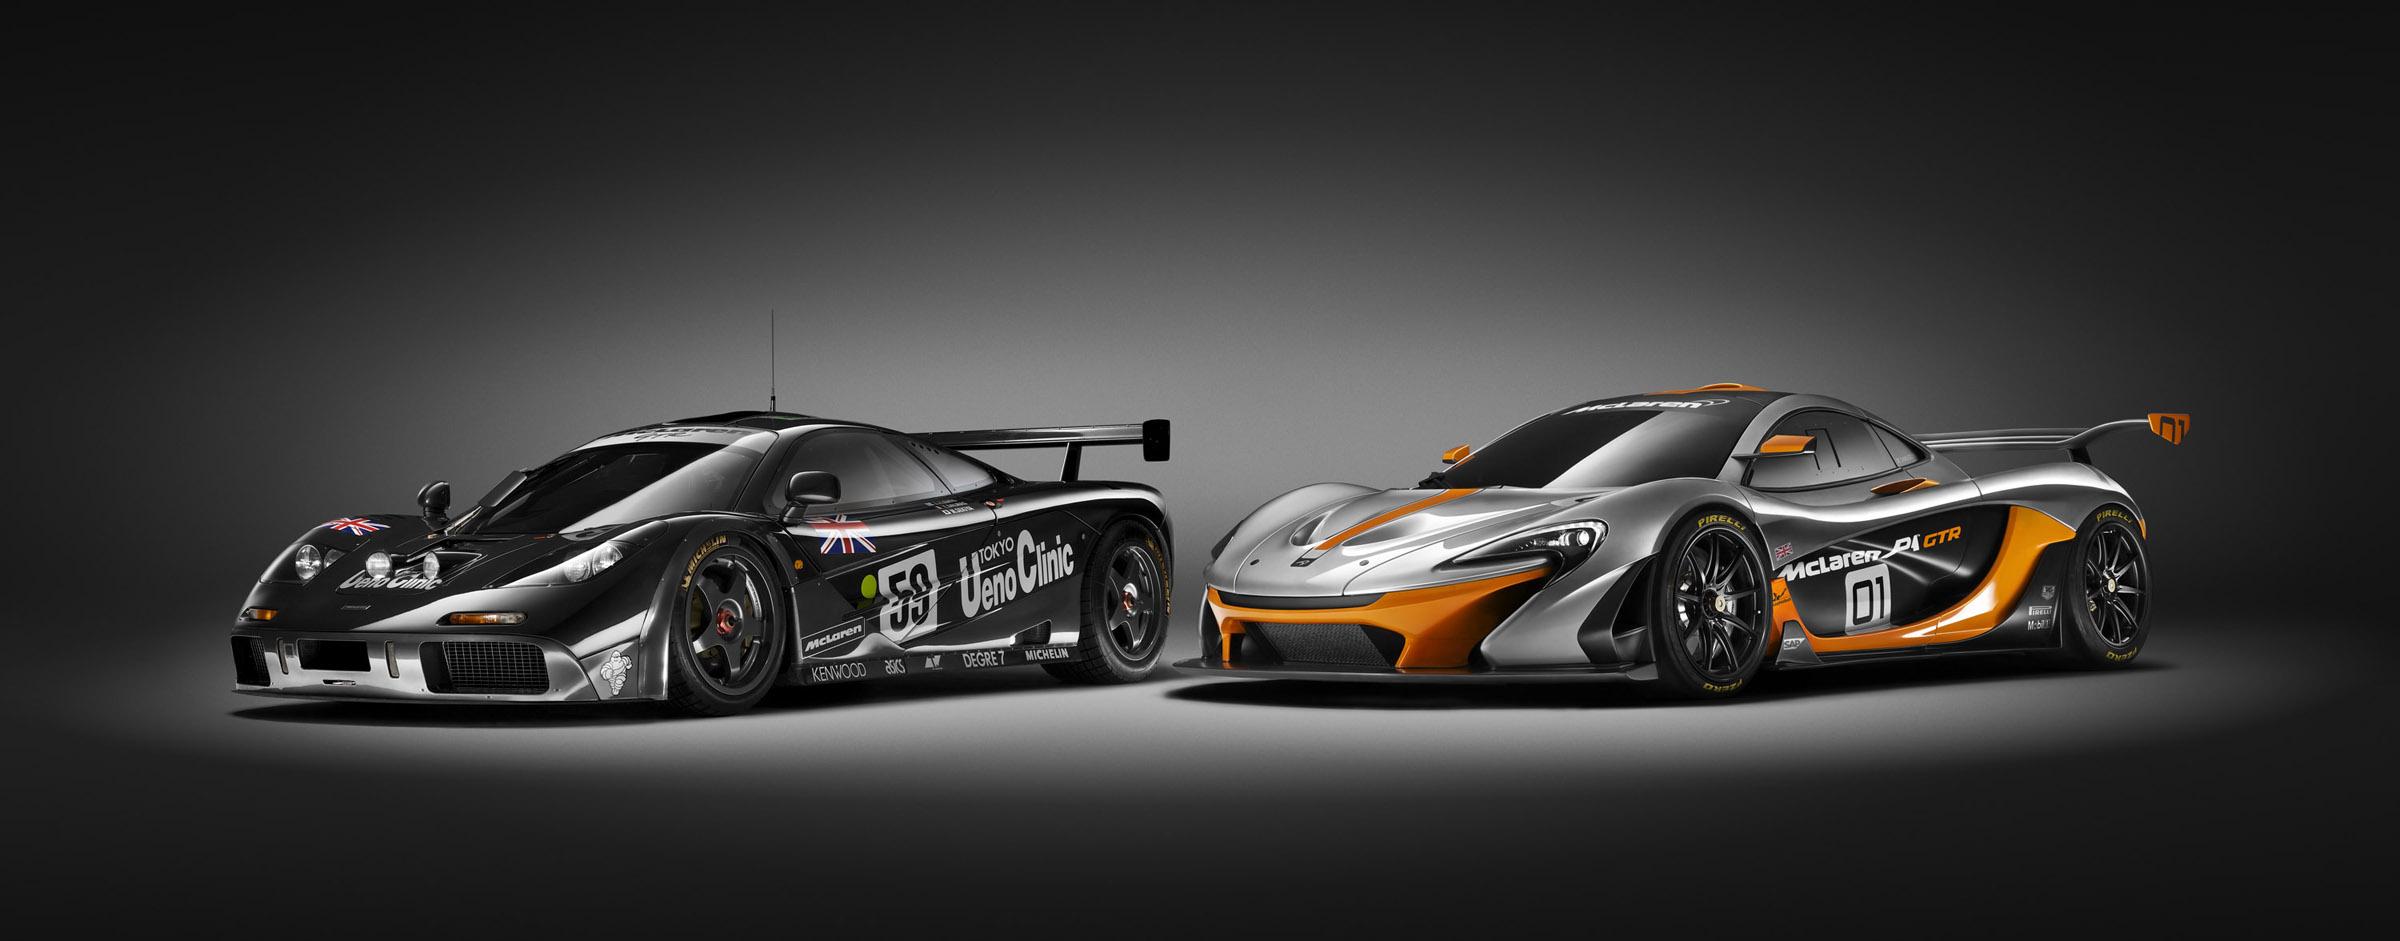 2014 McLaren P1 GTR Concept